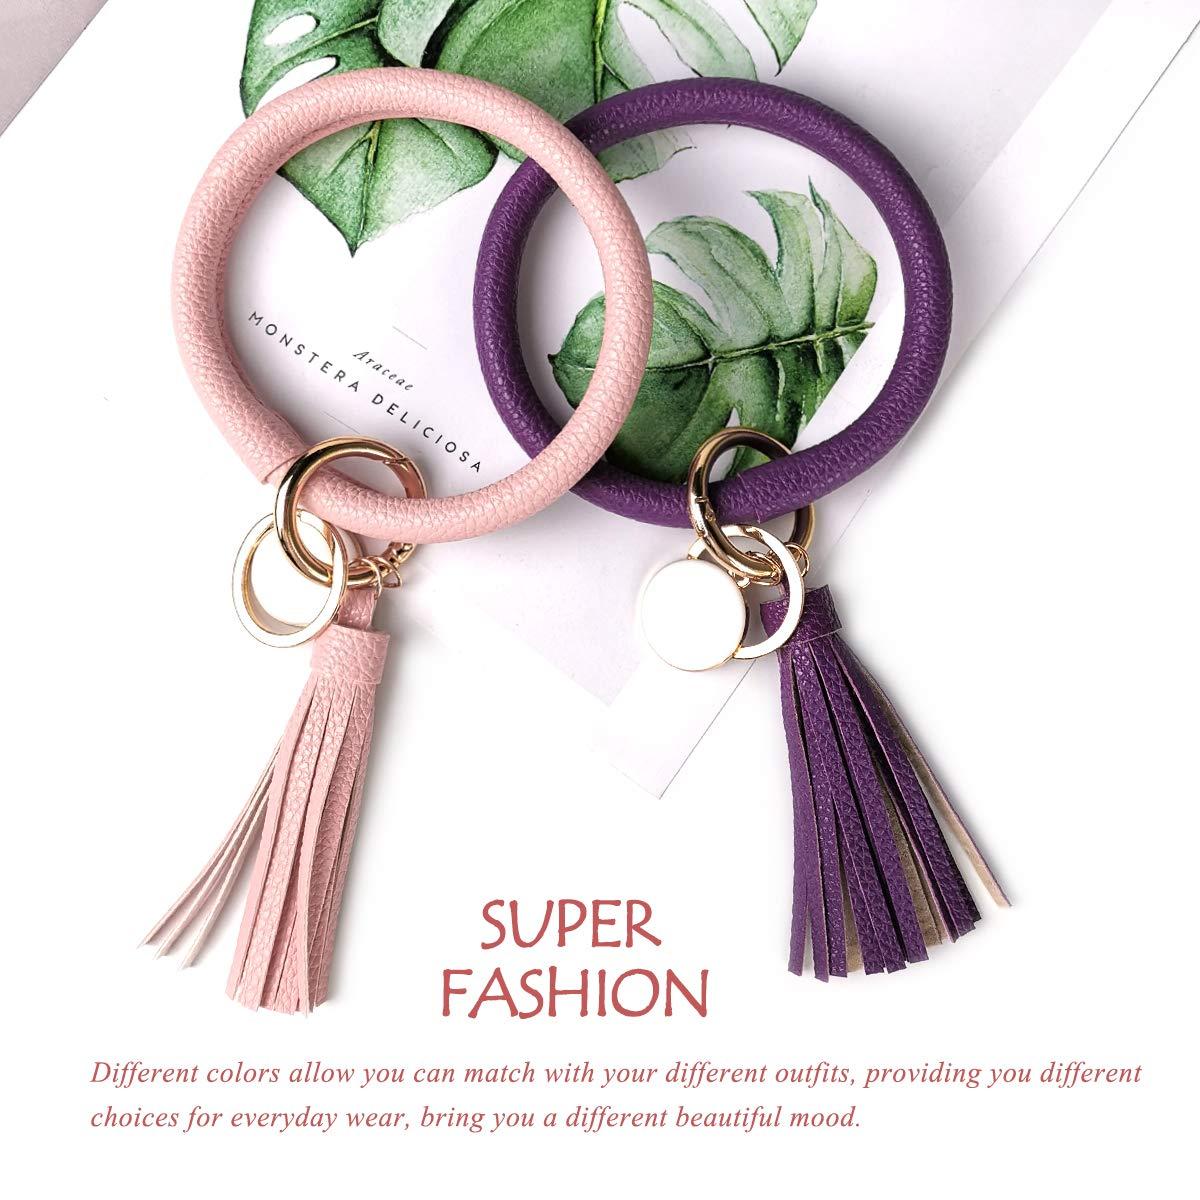 Tassel Ring o Key Ring Keychain Wristlet for Women Girls Leather Bracelet Key Ring Bangle Keyring Free Your Hands